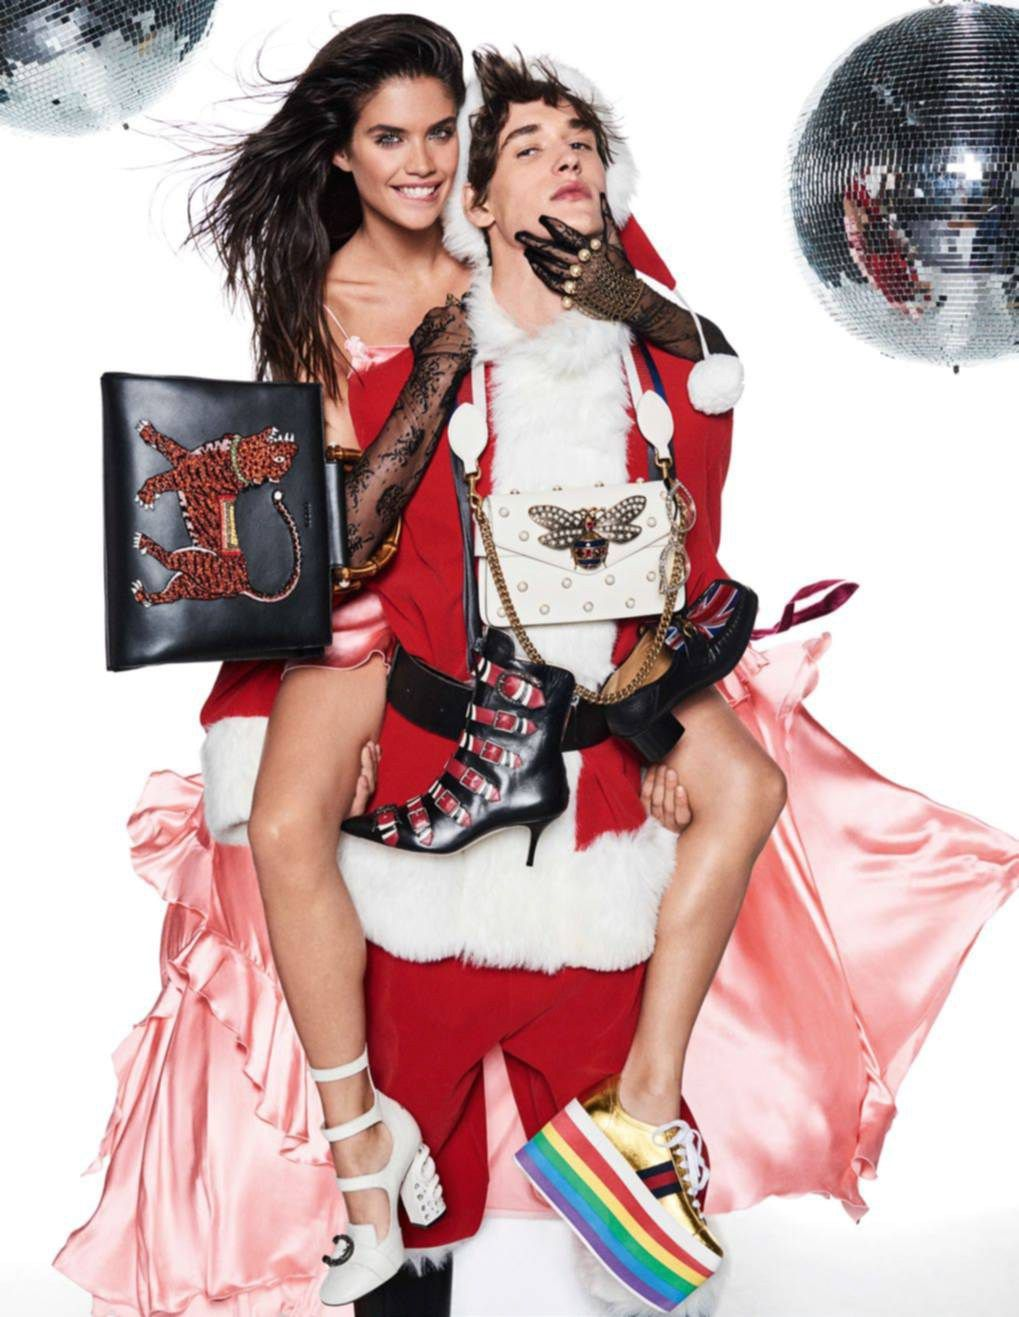 Publication: Vogue Paris December/January 2016-2017 Model: Sara Sampaio, Stella Maxwell Photographer: Giampaolo Sgura